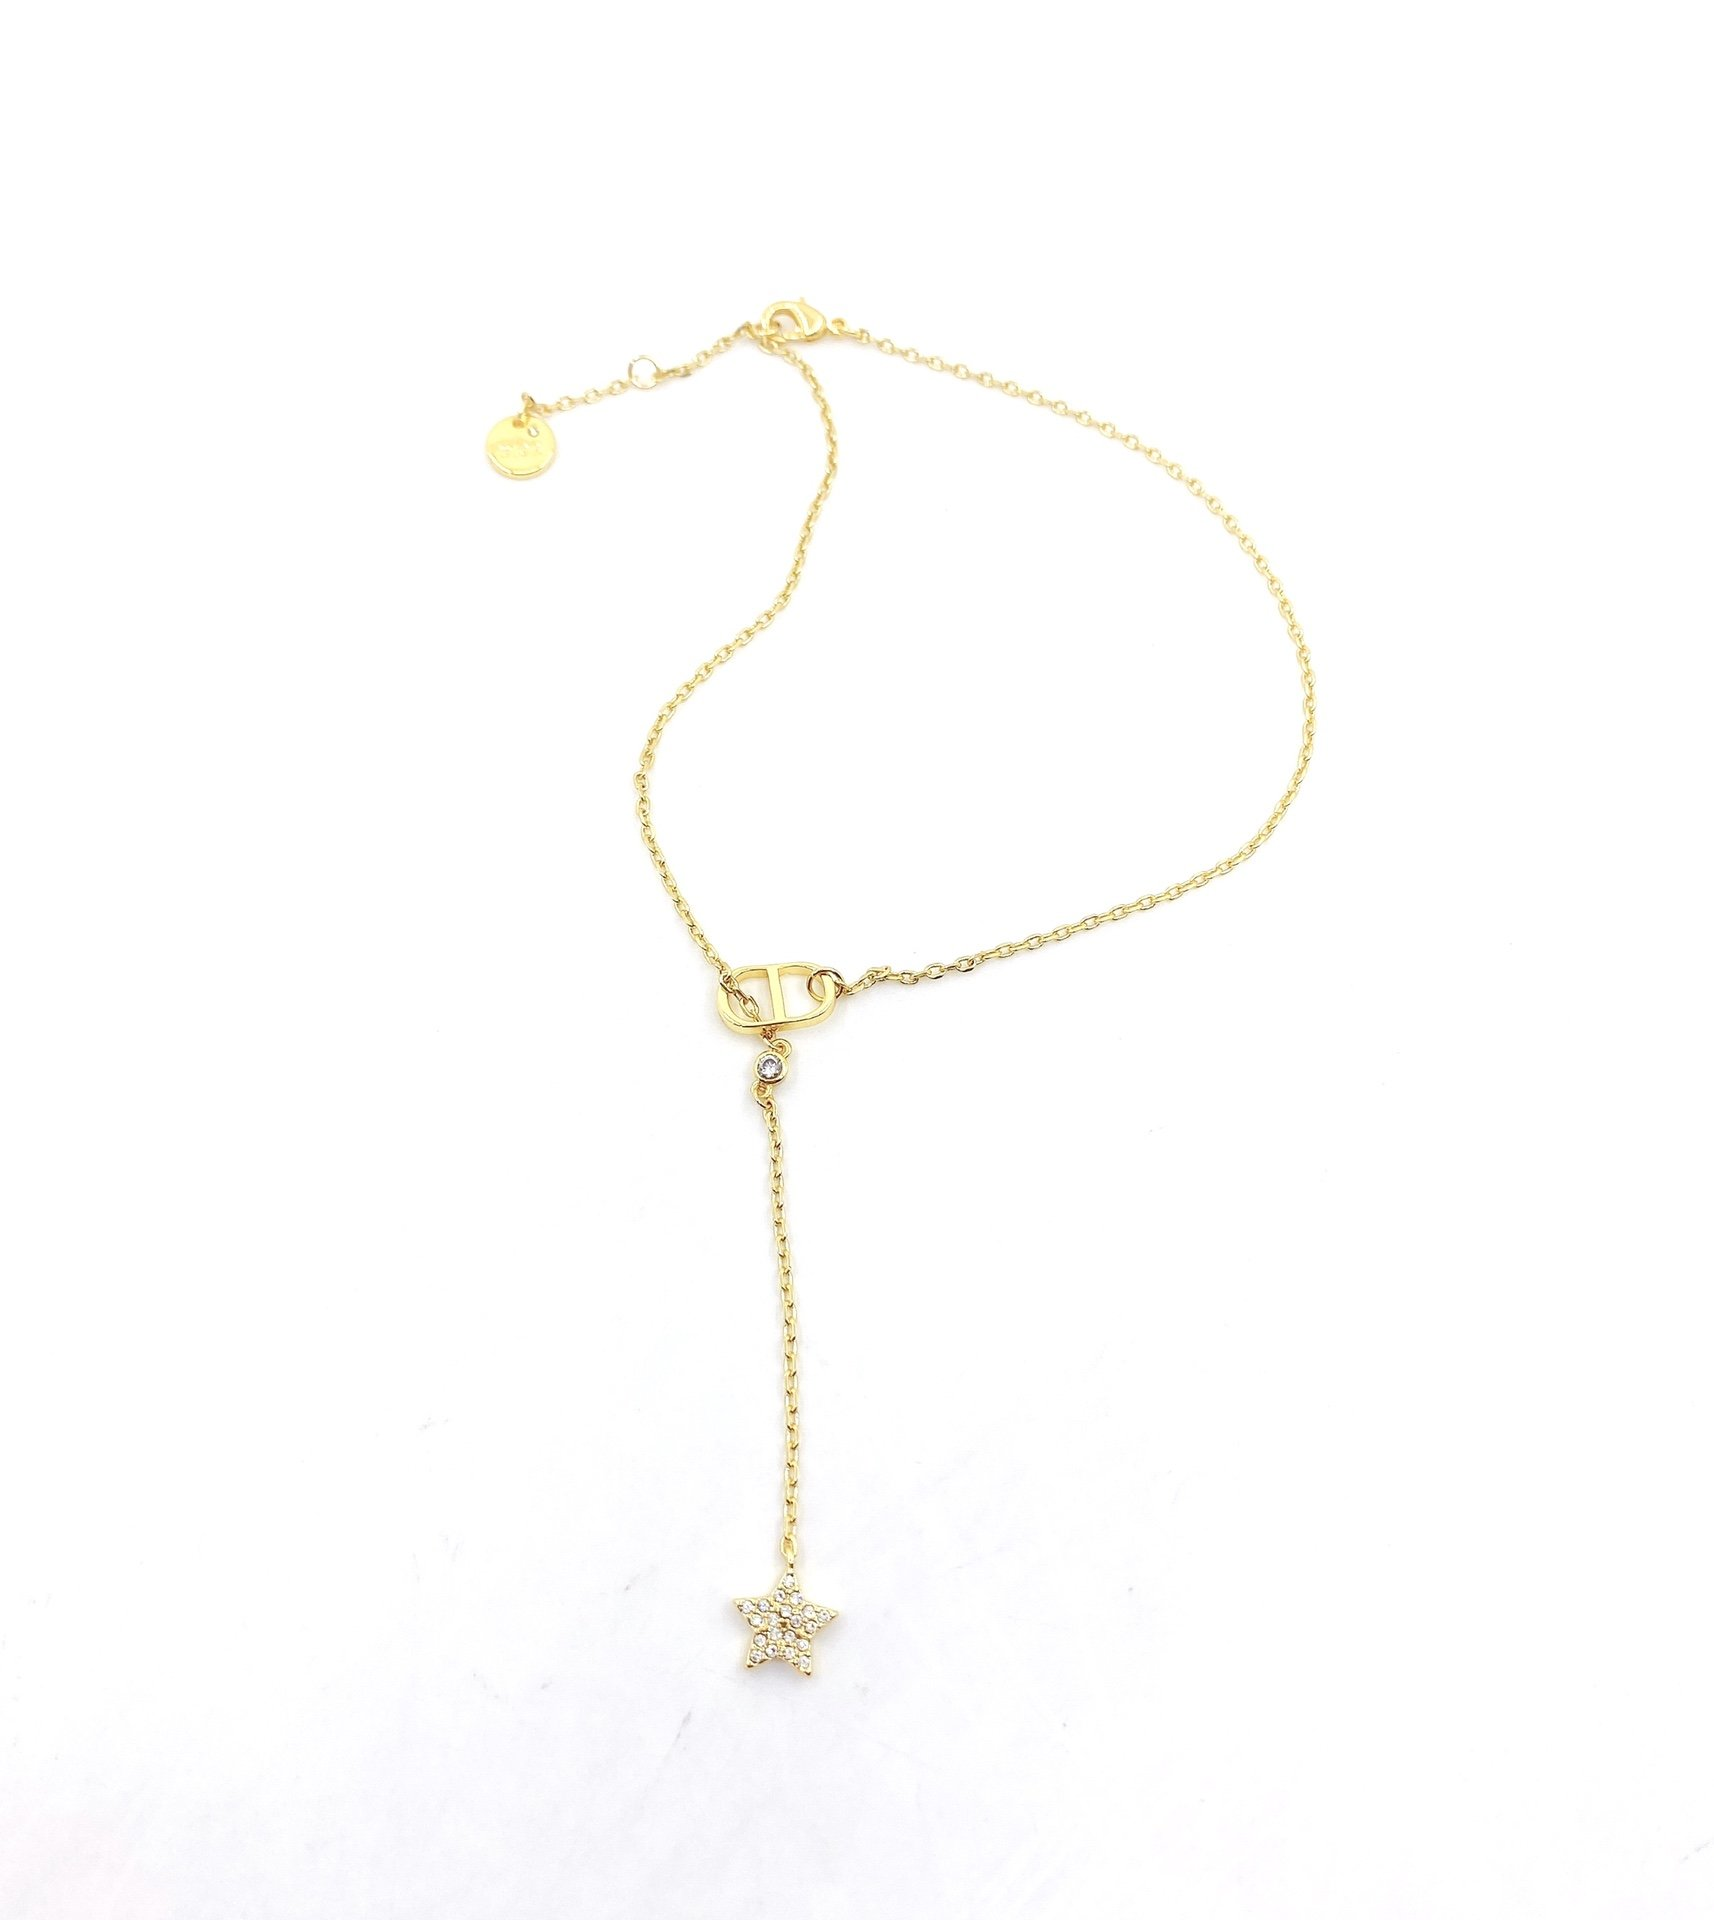 Dior新款项链一致黄铜材质